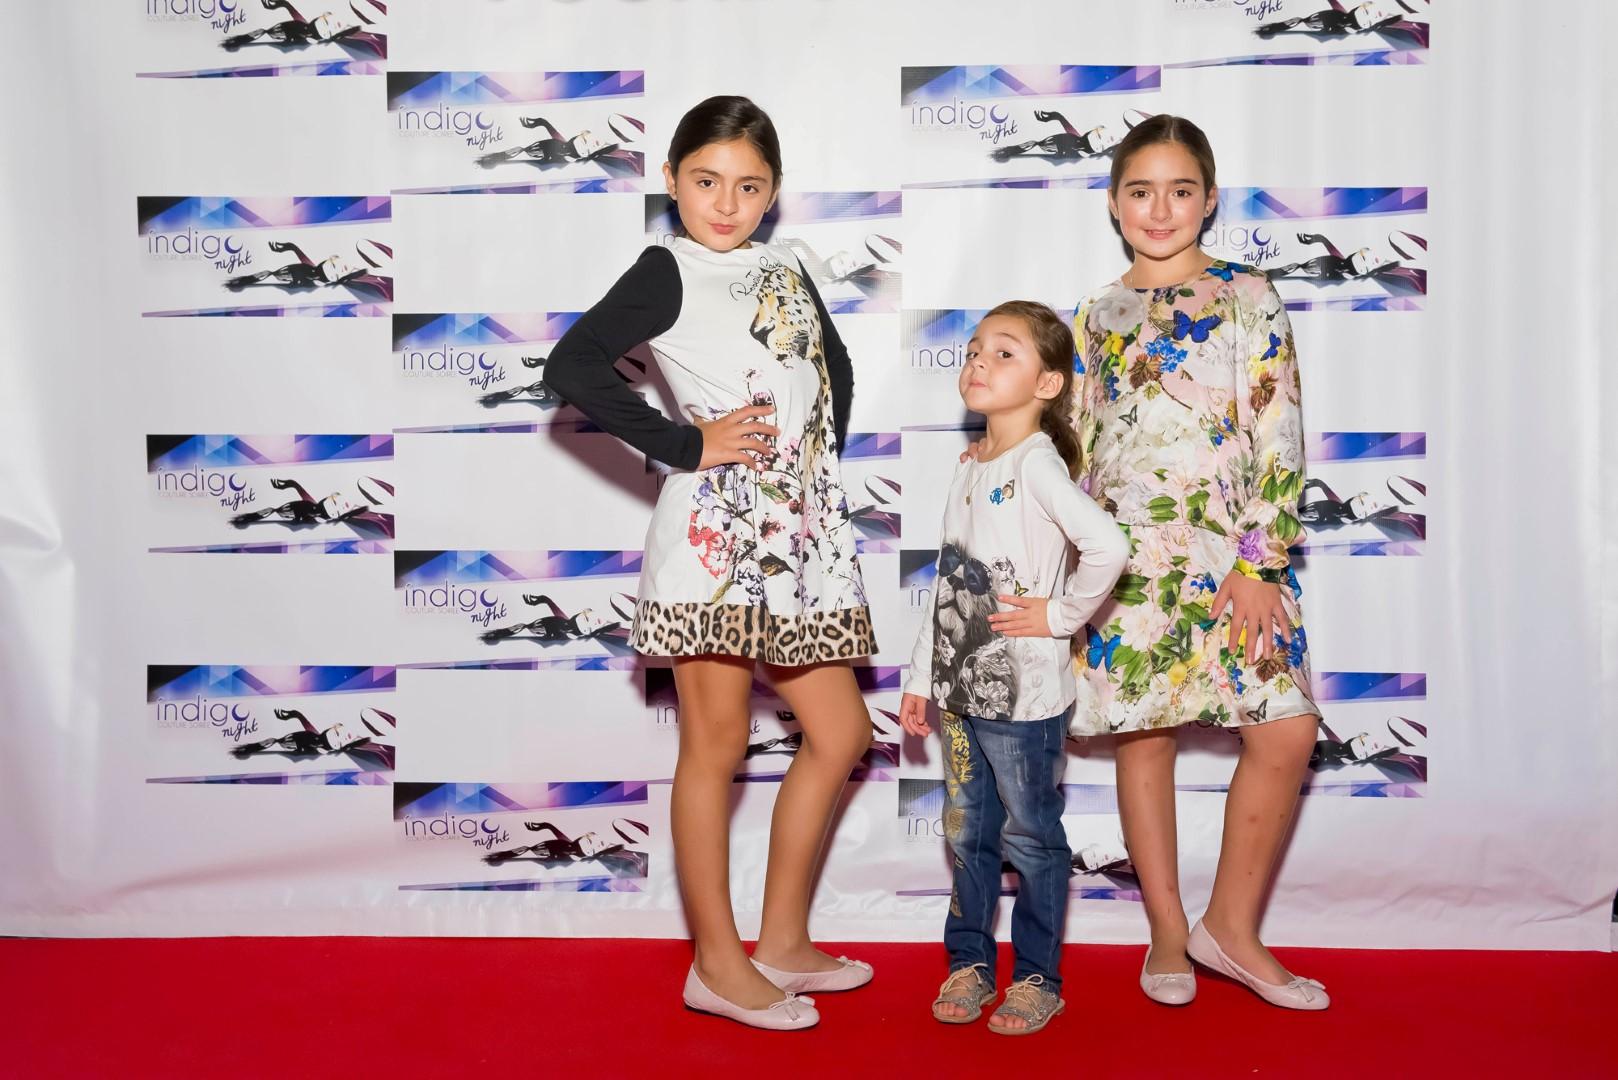 Macarena, Natalia and Carmina Chavez-Zamorano